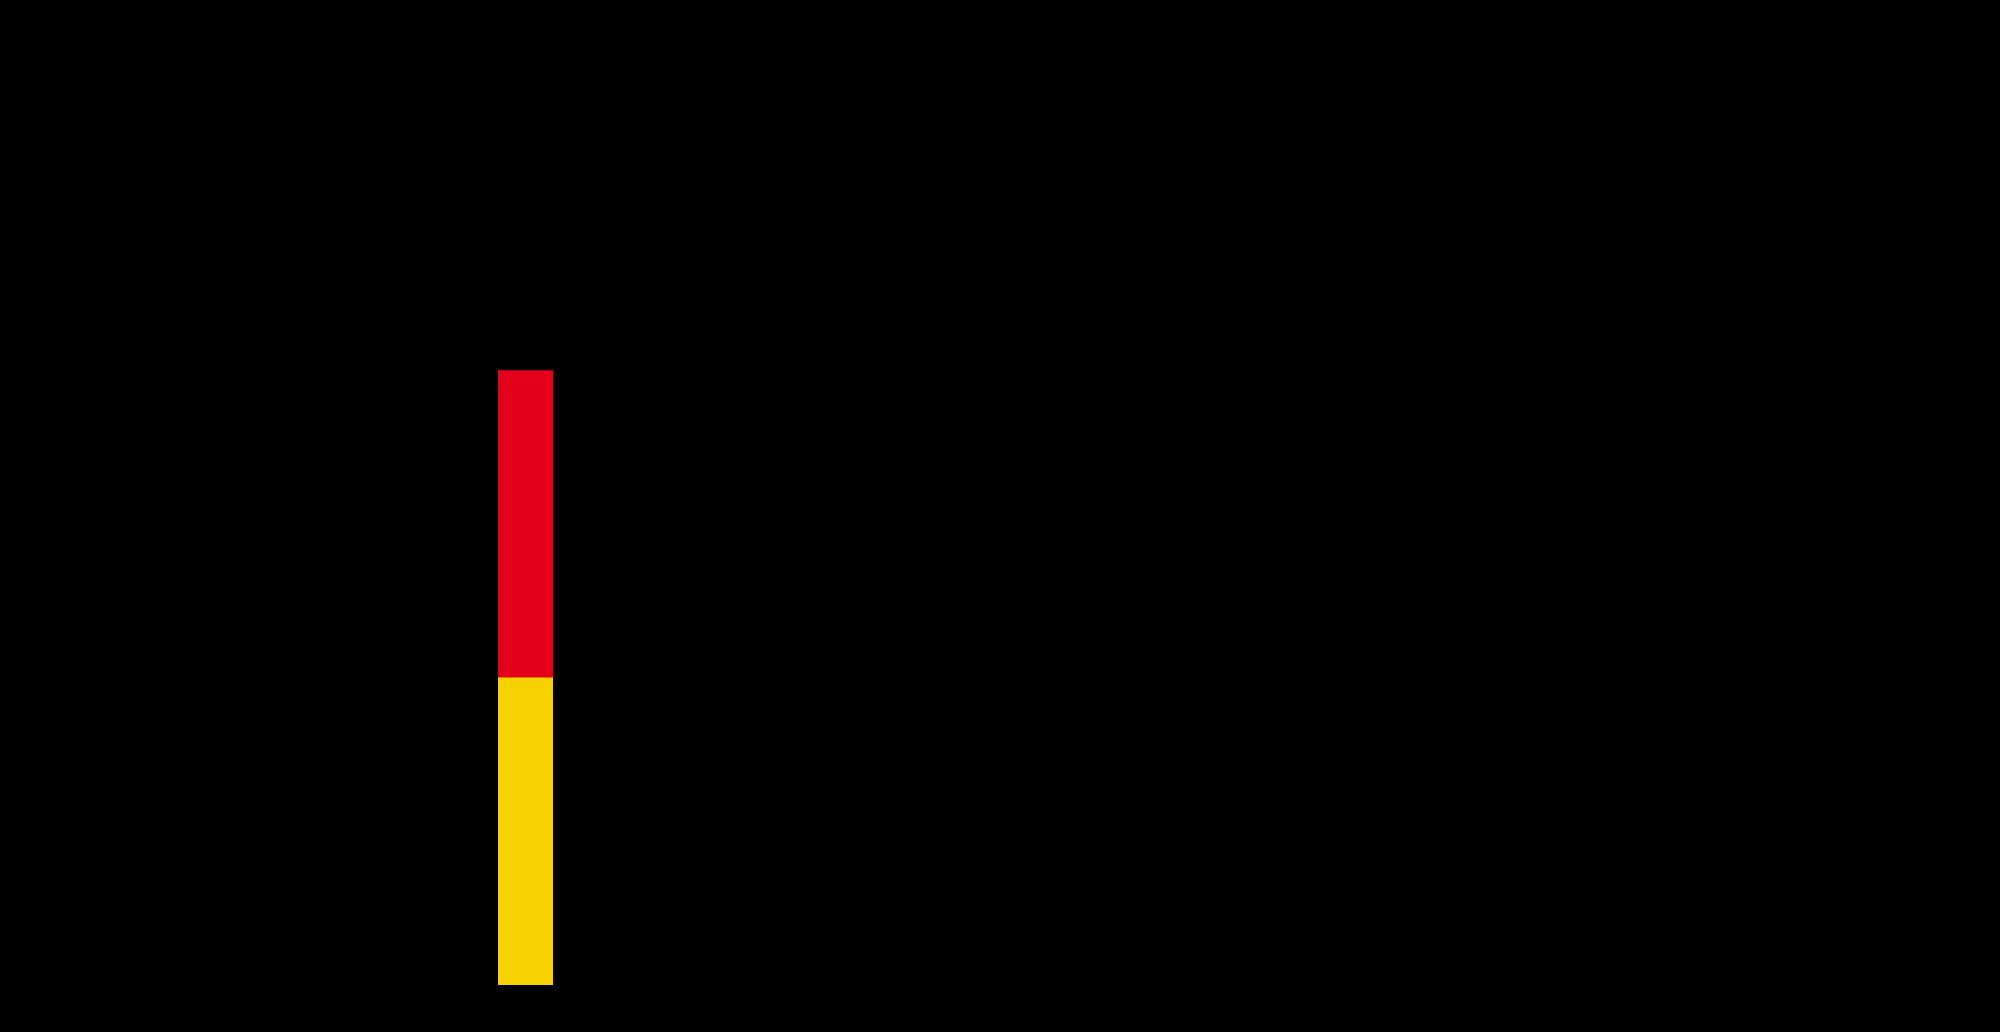 bmbf-logo_ohne_gefördert.png